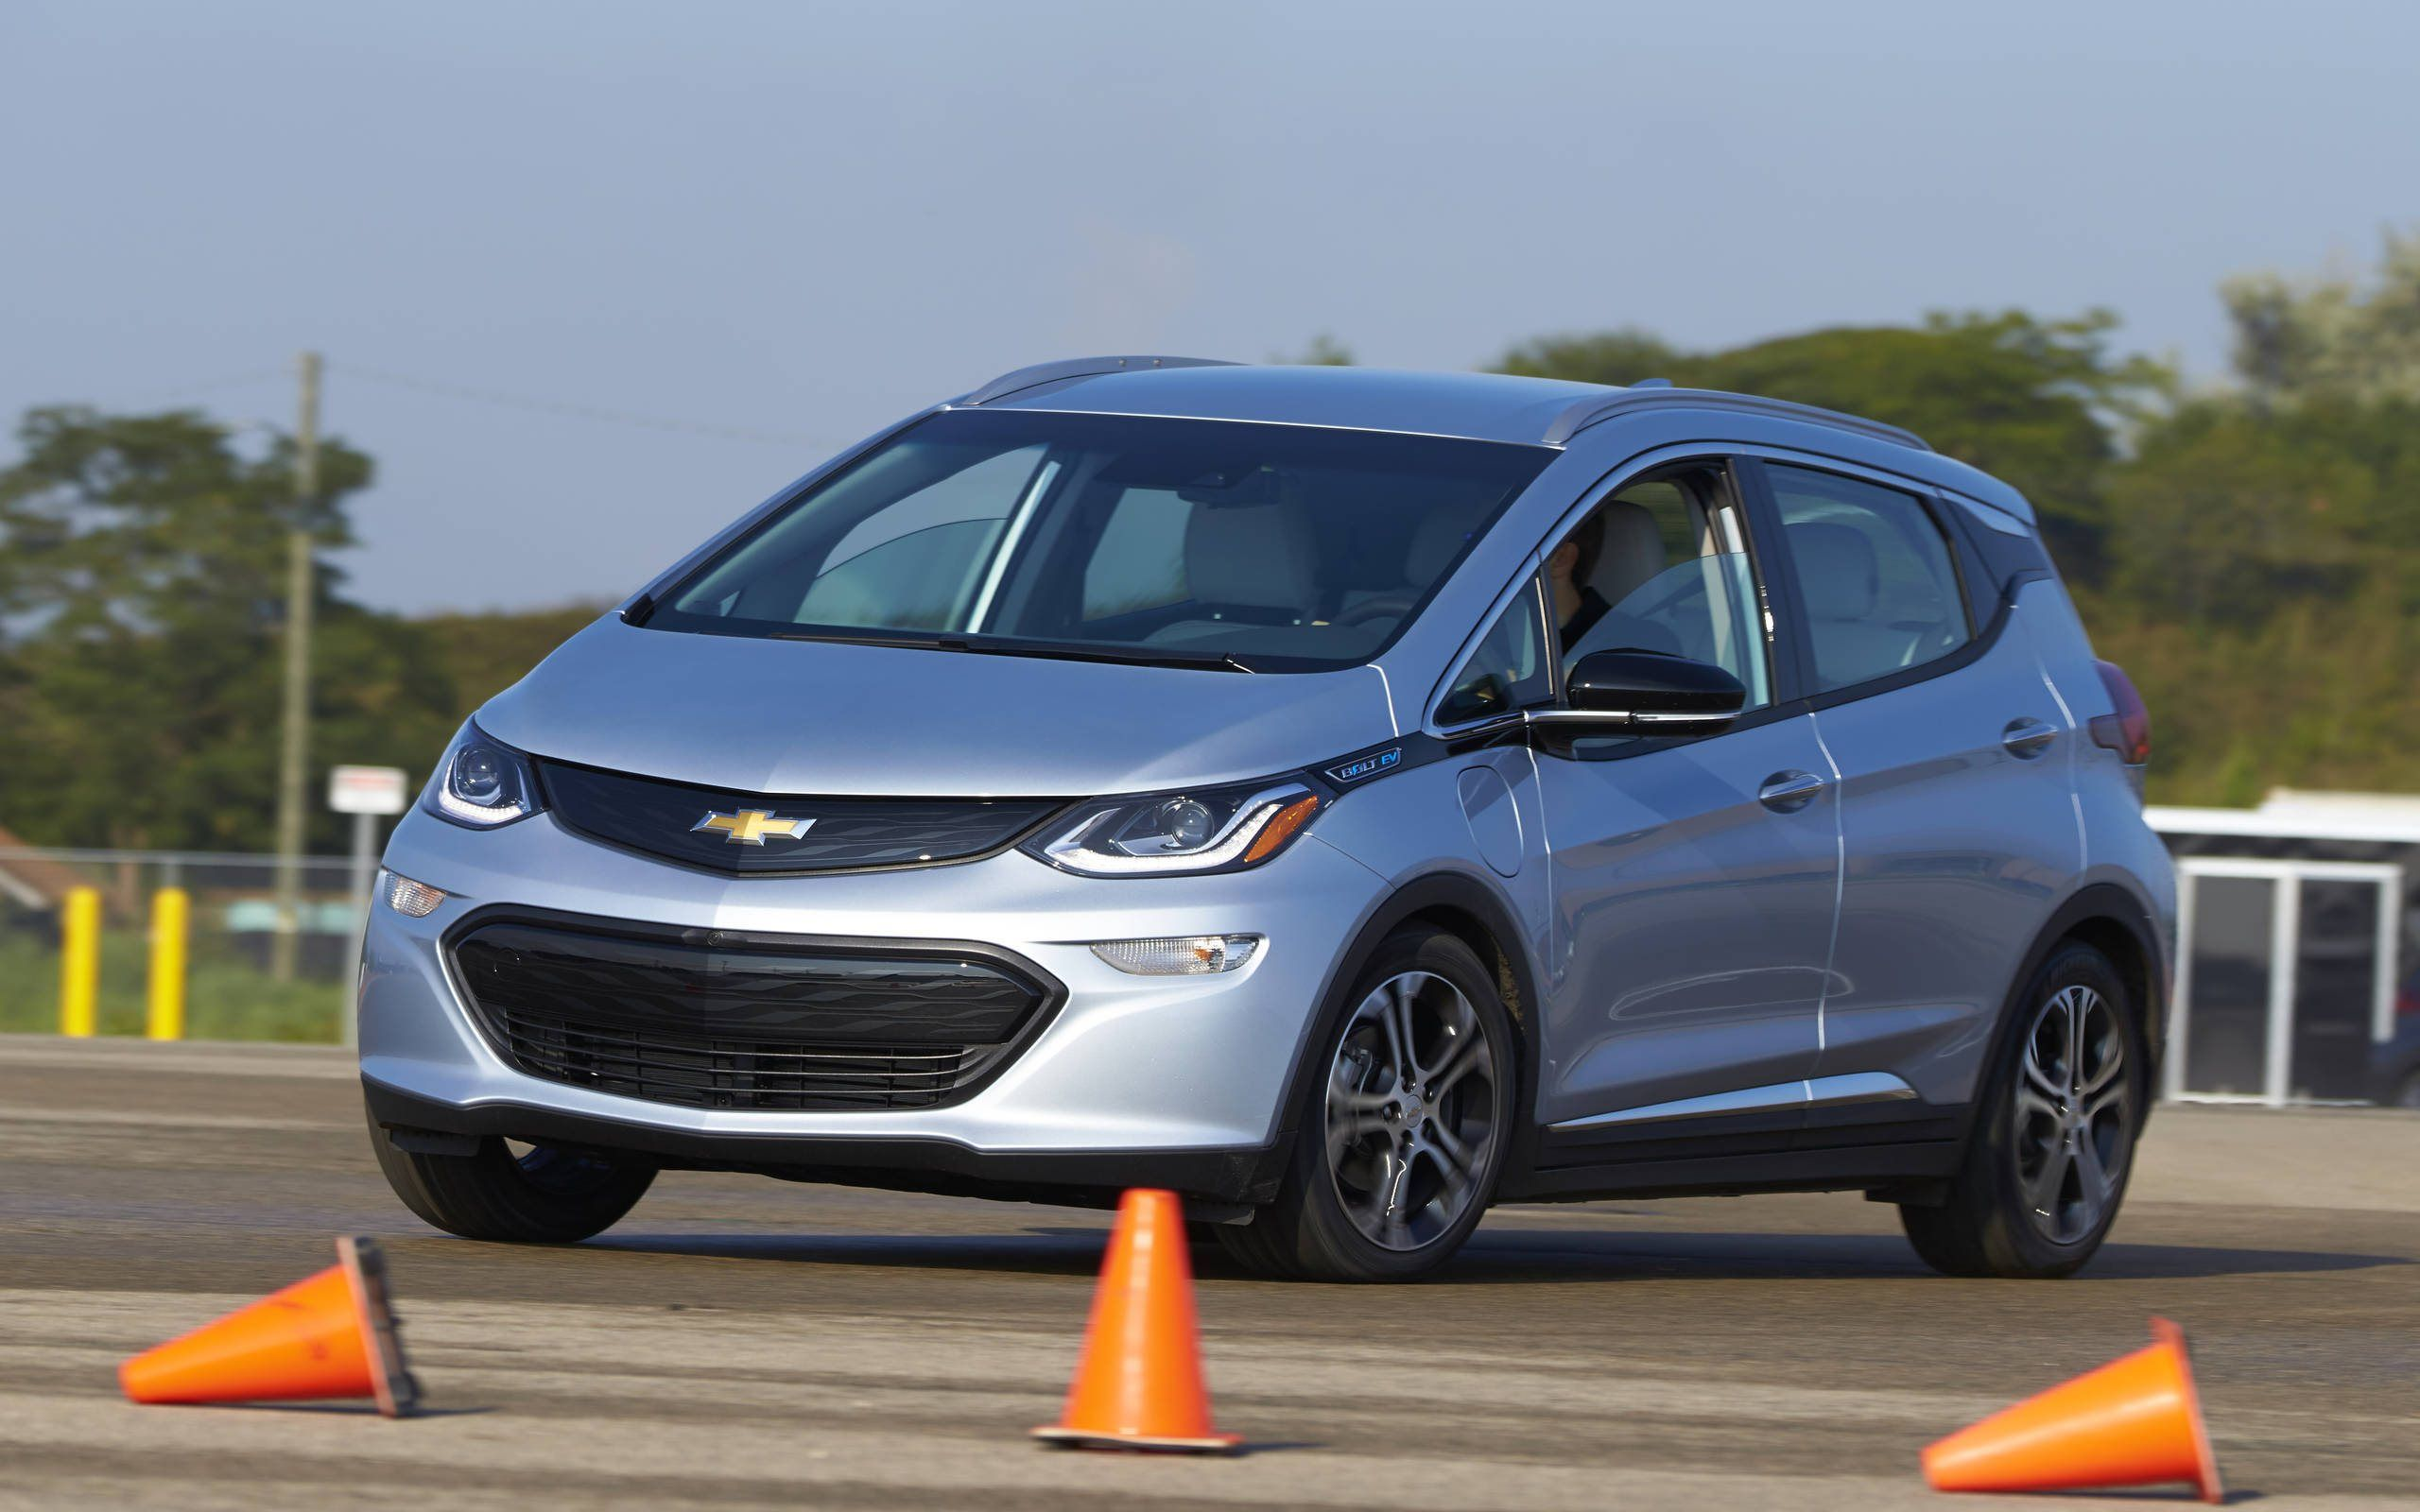 2021 Chevrolet Volt New Concept in 2020 Chevrolet volt